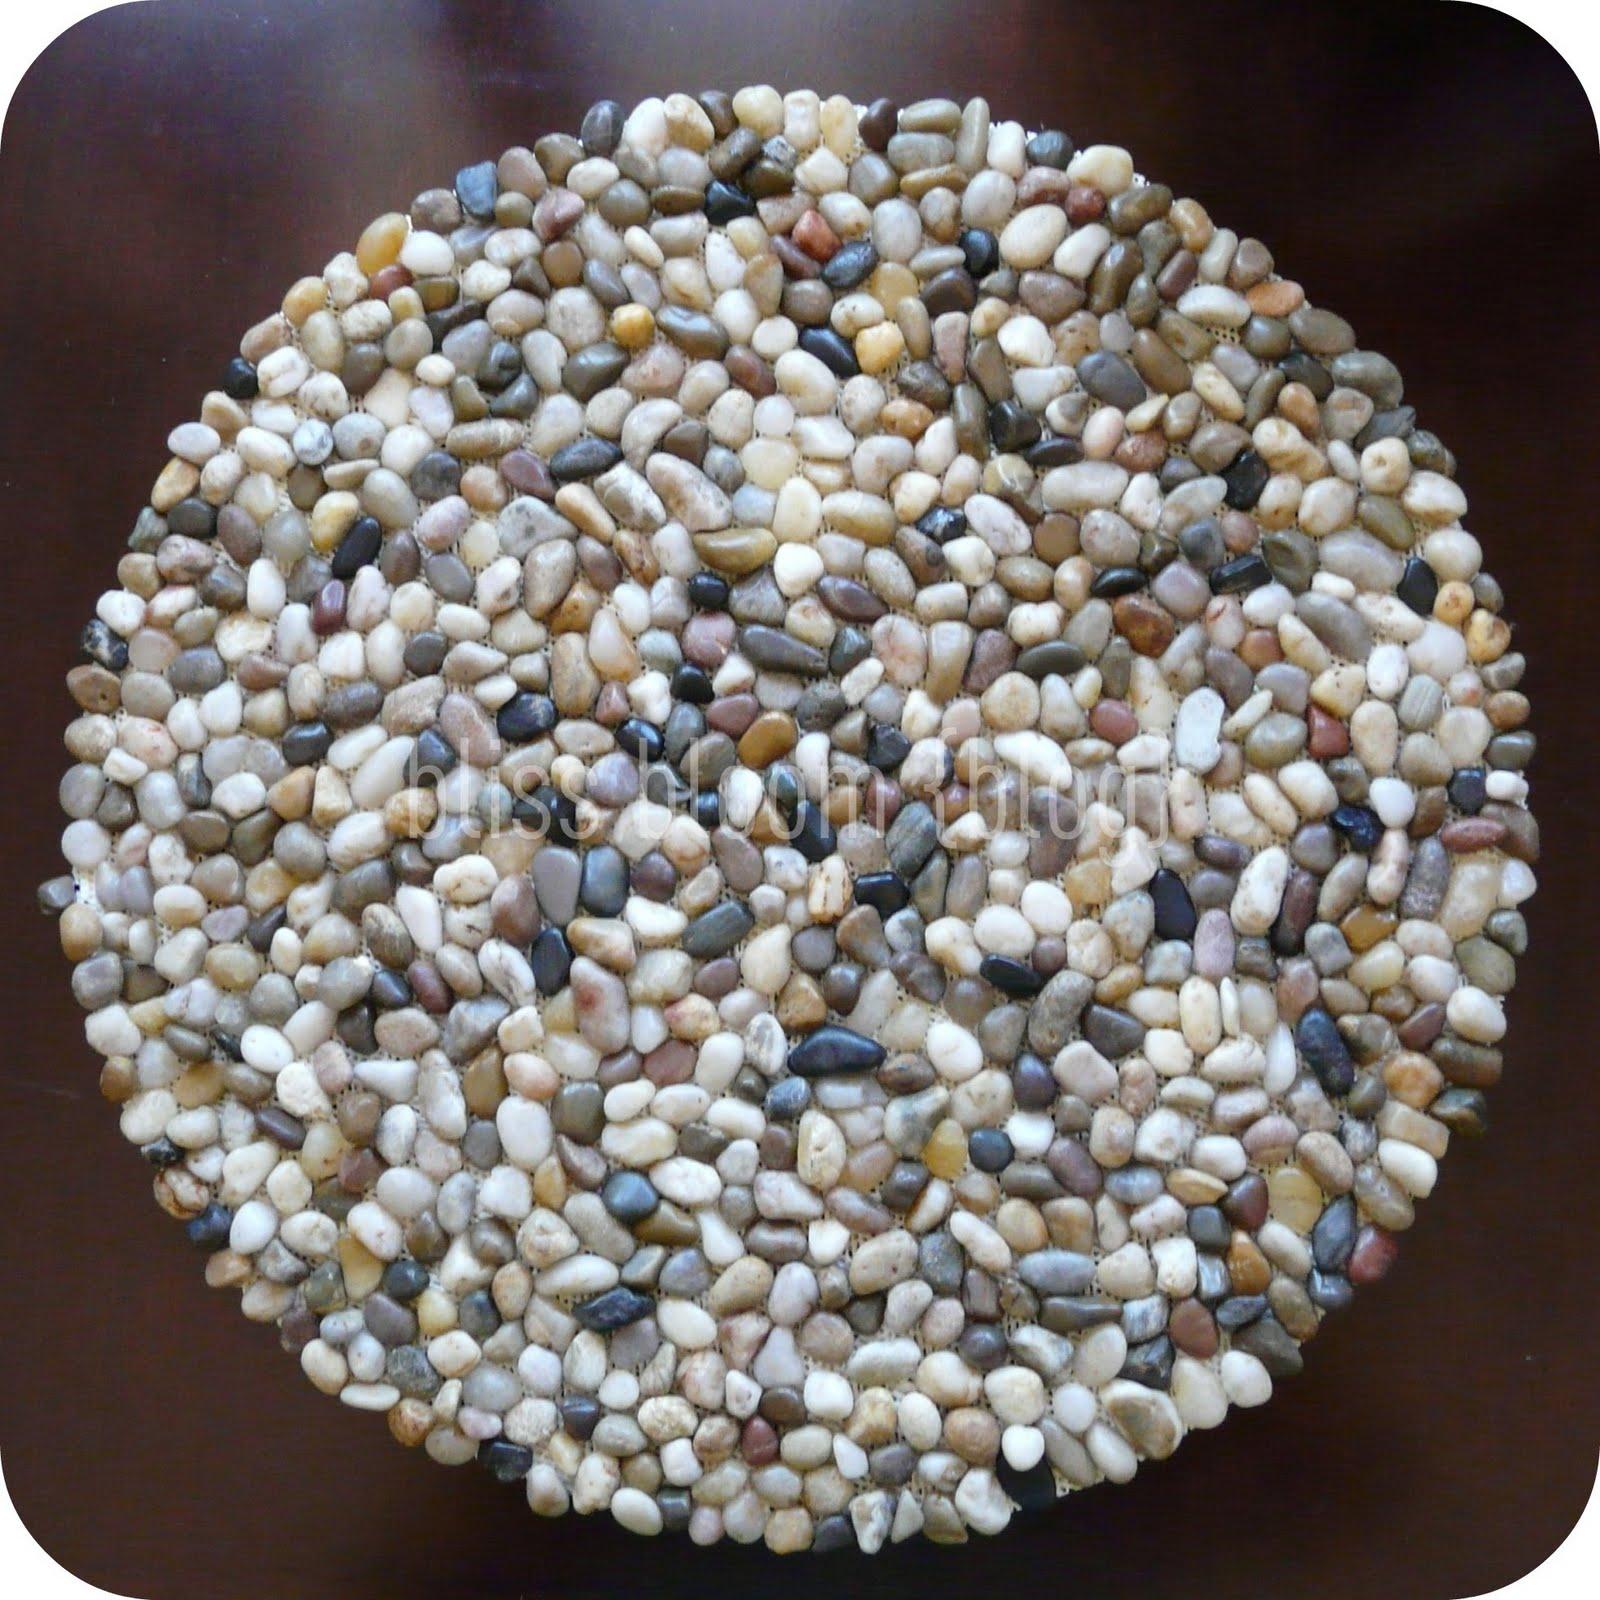 [Make] Stone Placemat